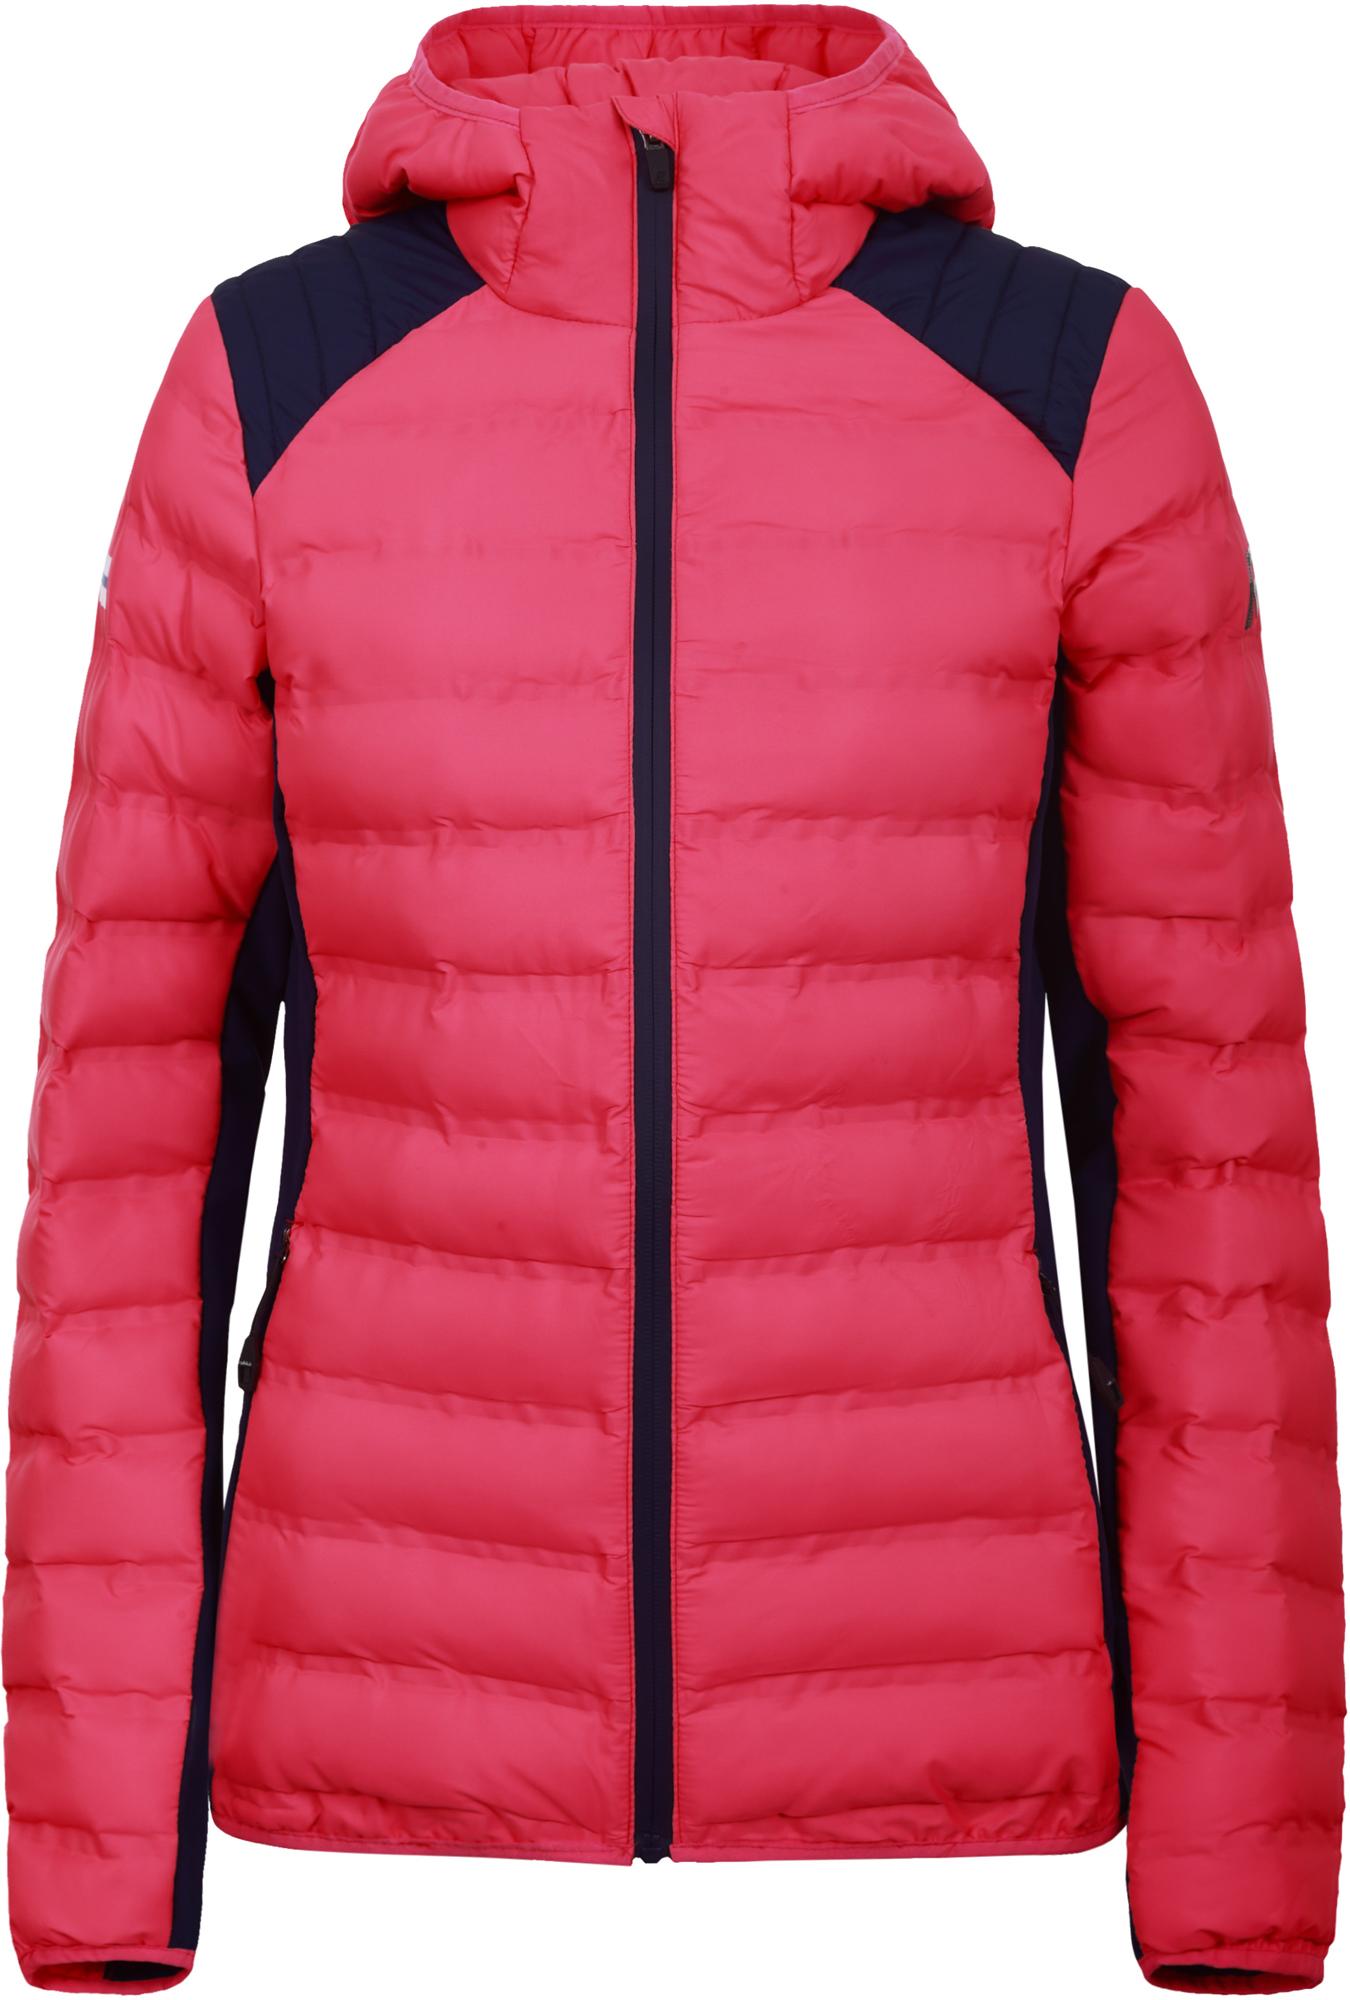 Rukka Куртка утепленная женская Tuusula, размер 50